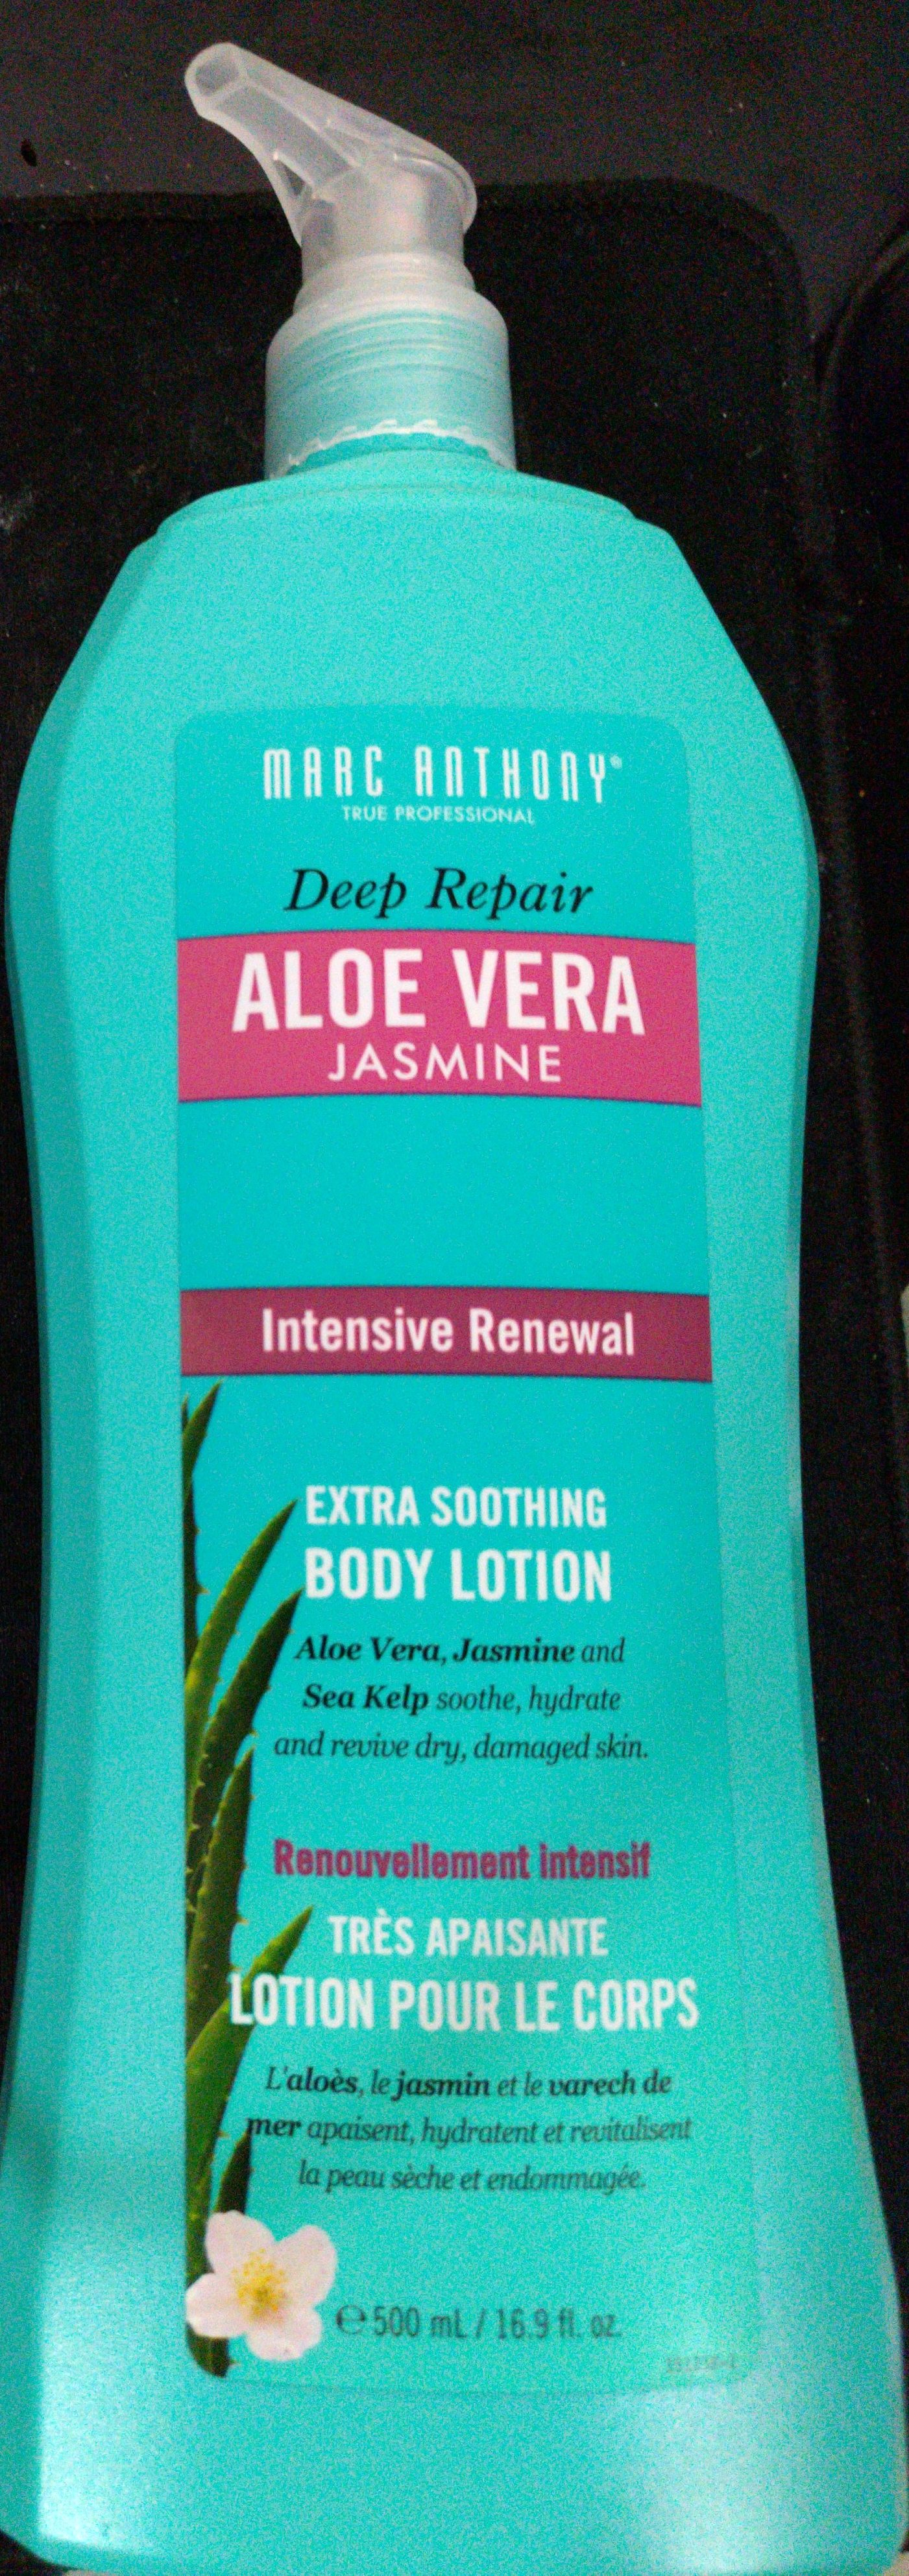 Deep Repair Aloe Vera Jasmine Body Lotion - Product